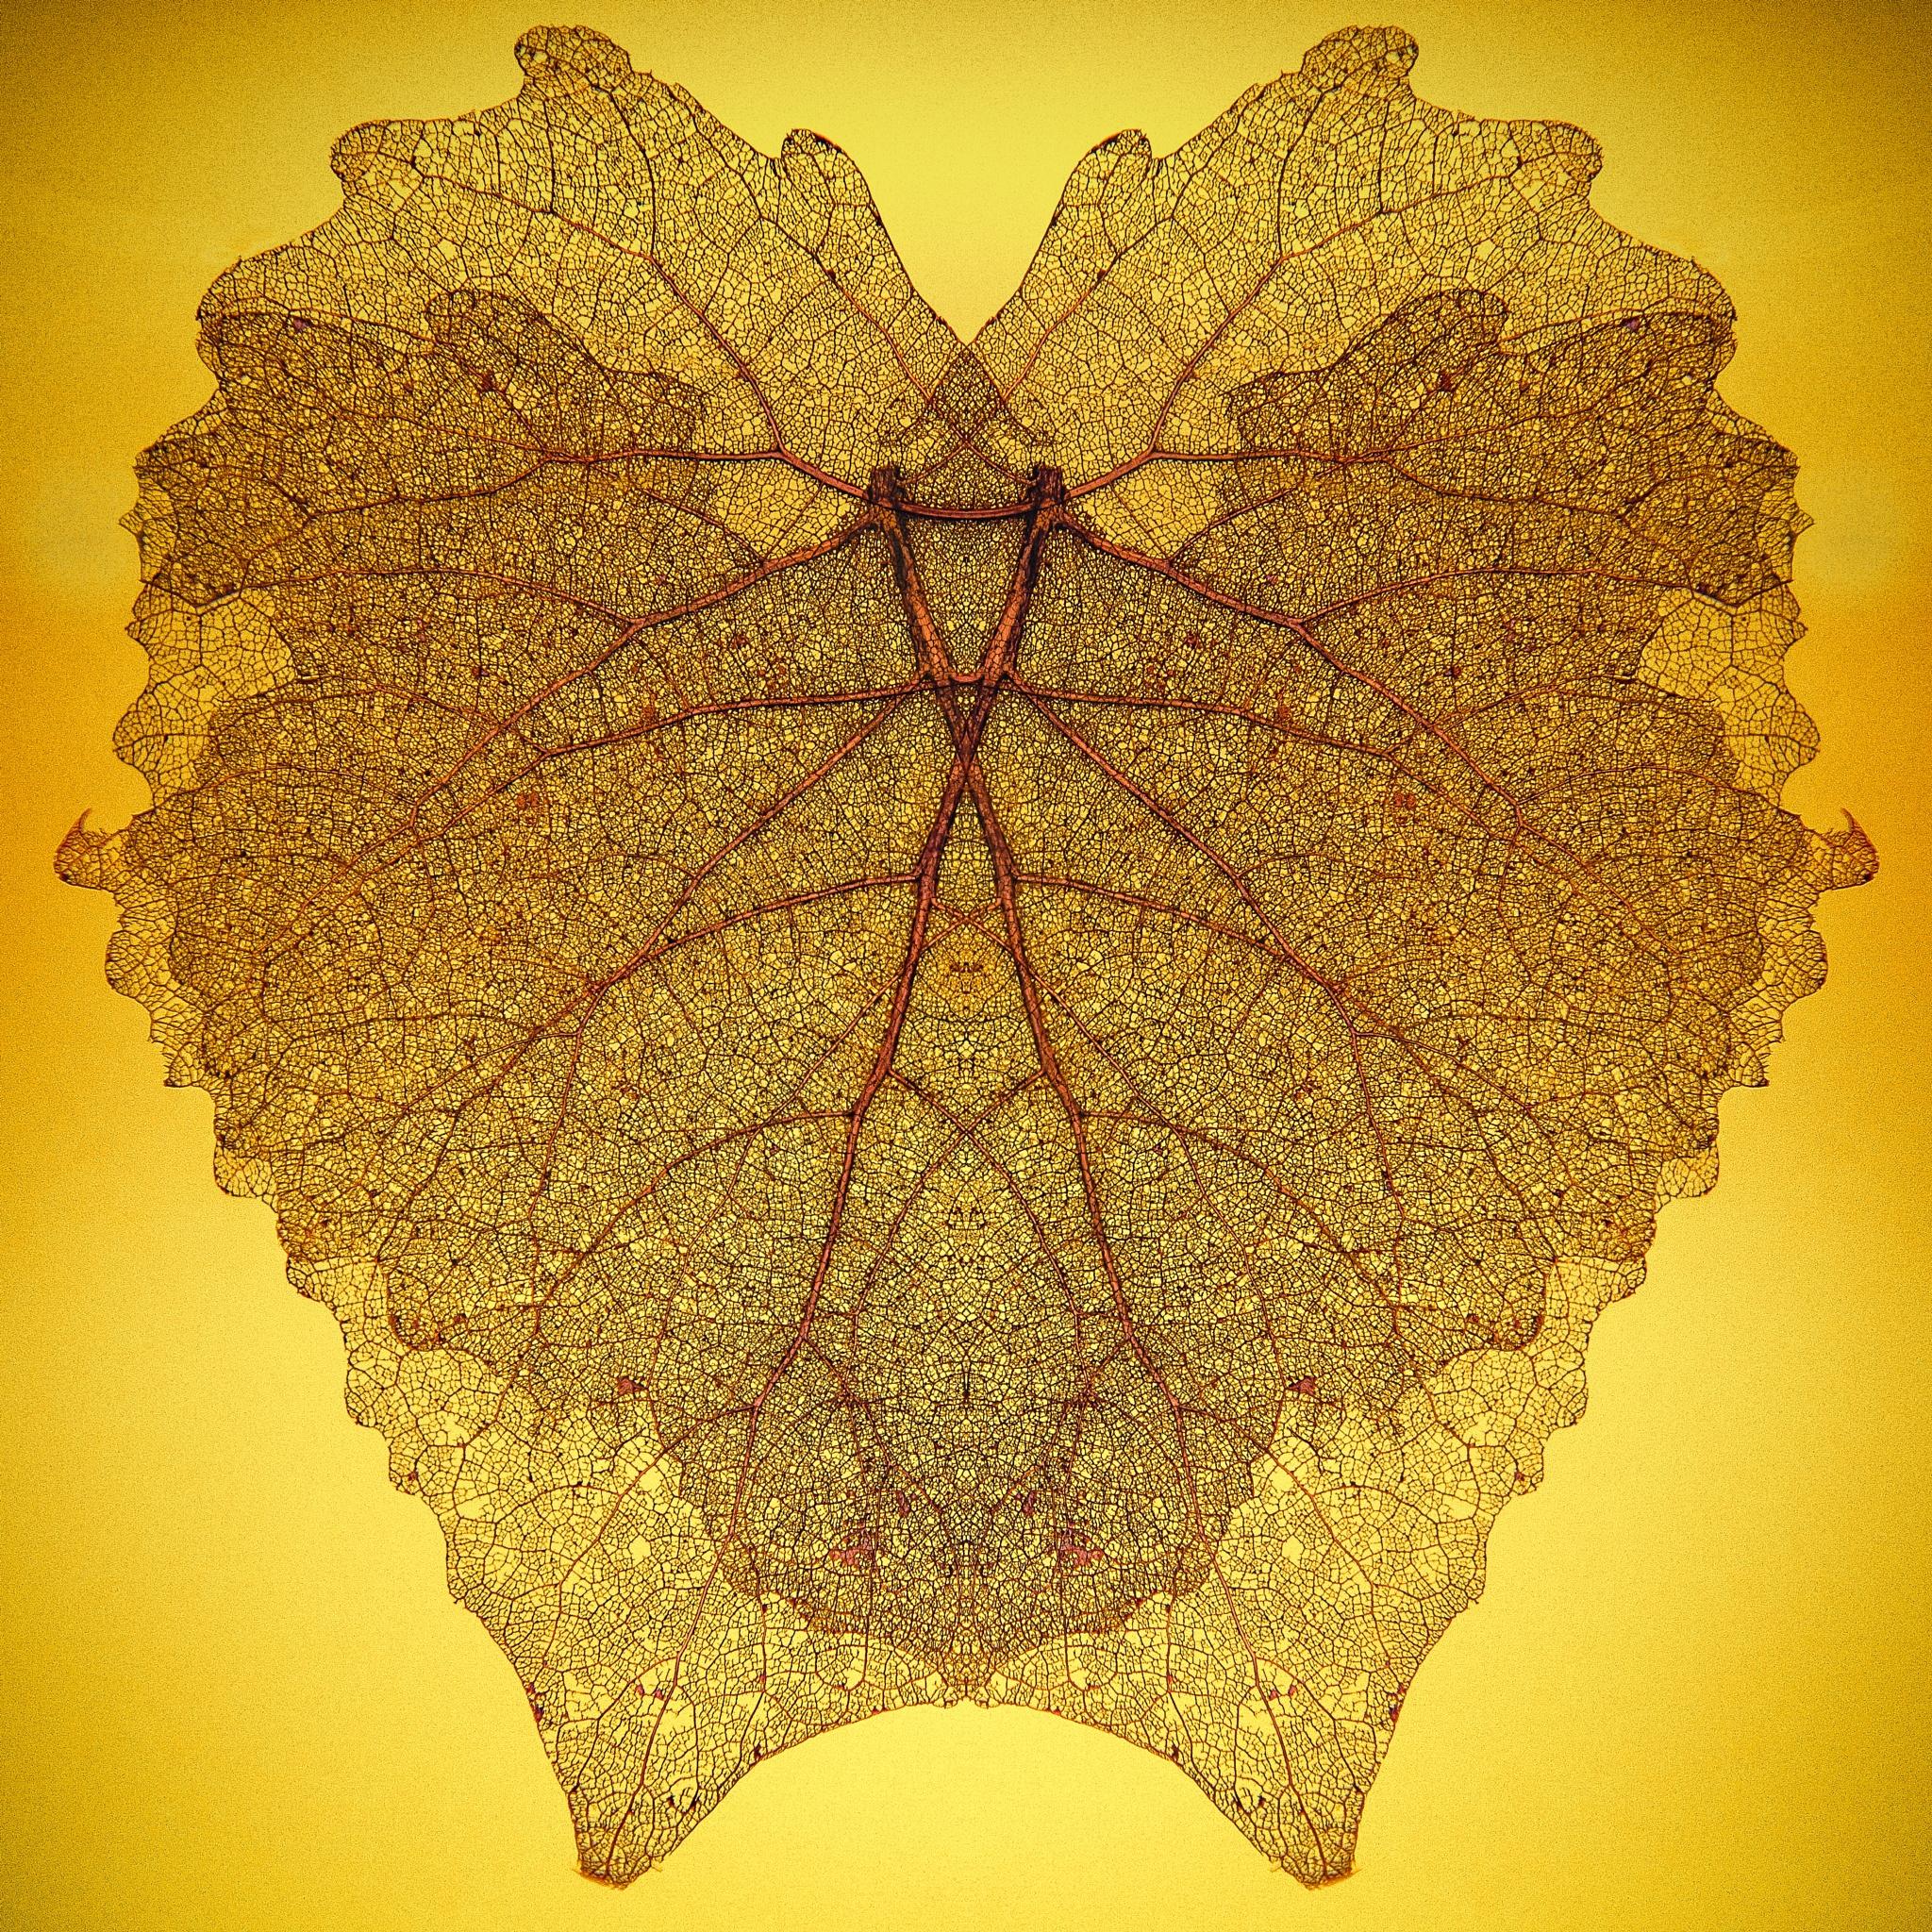 Leaf Creature by Heasley